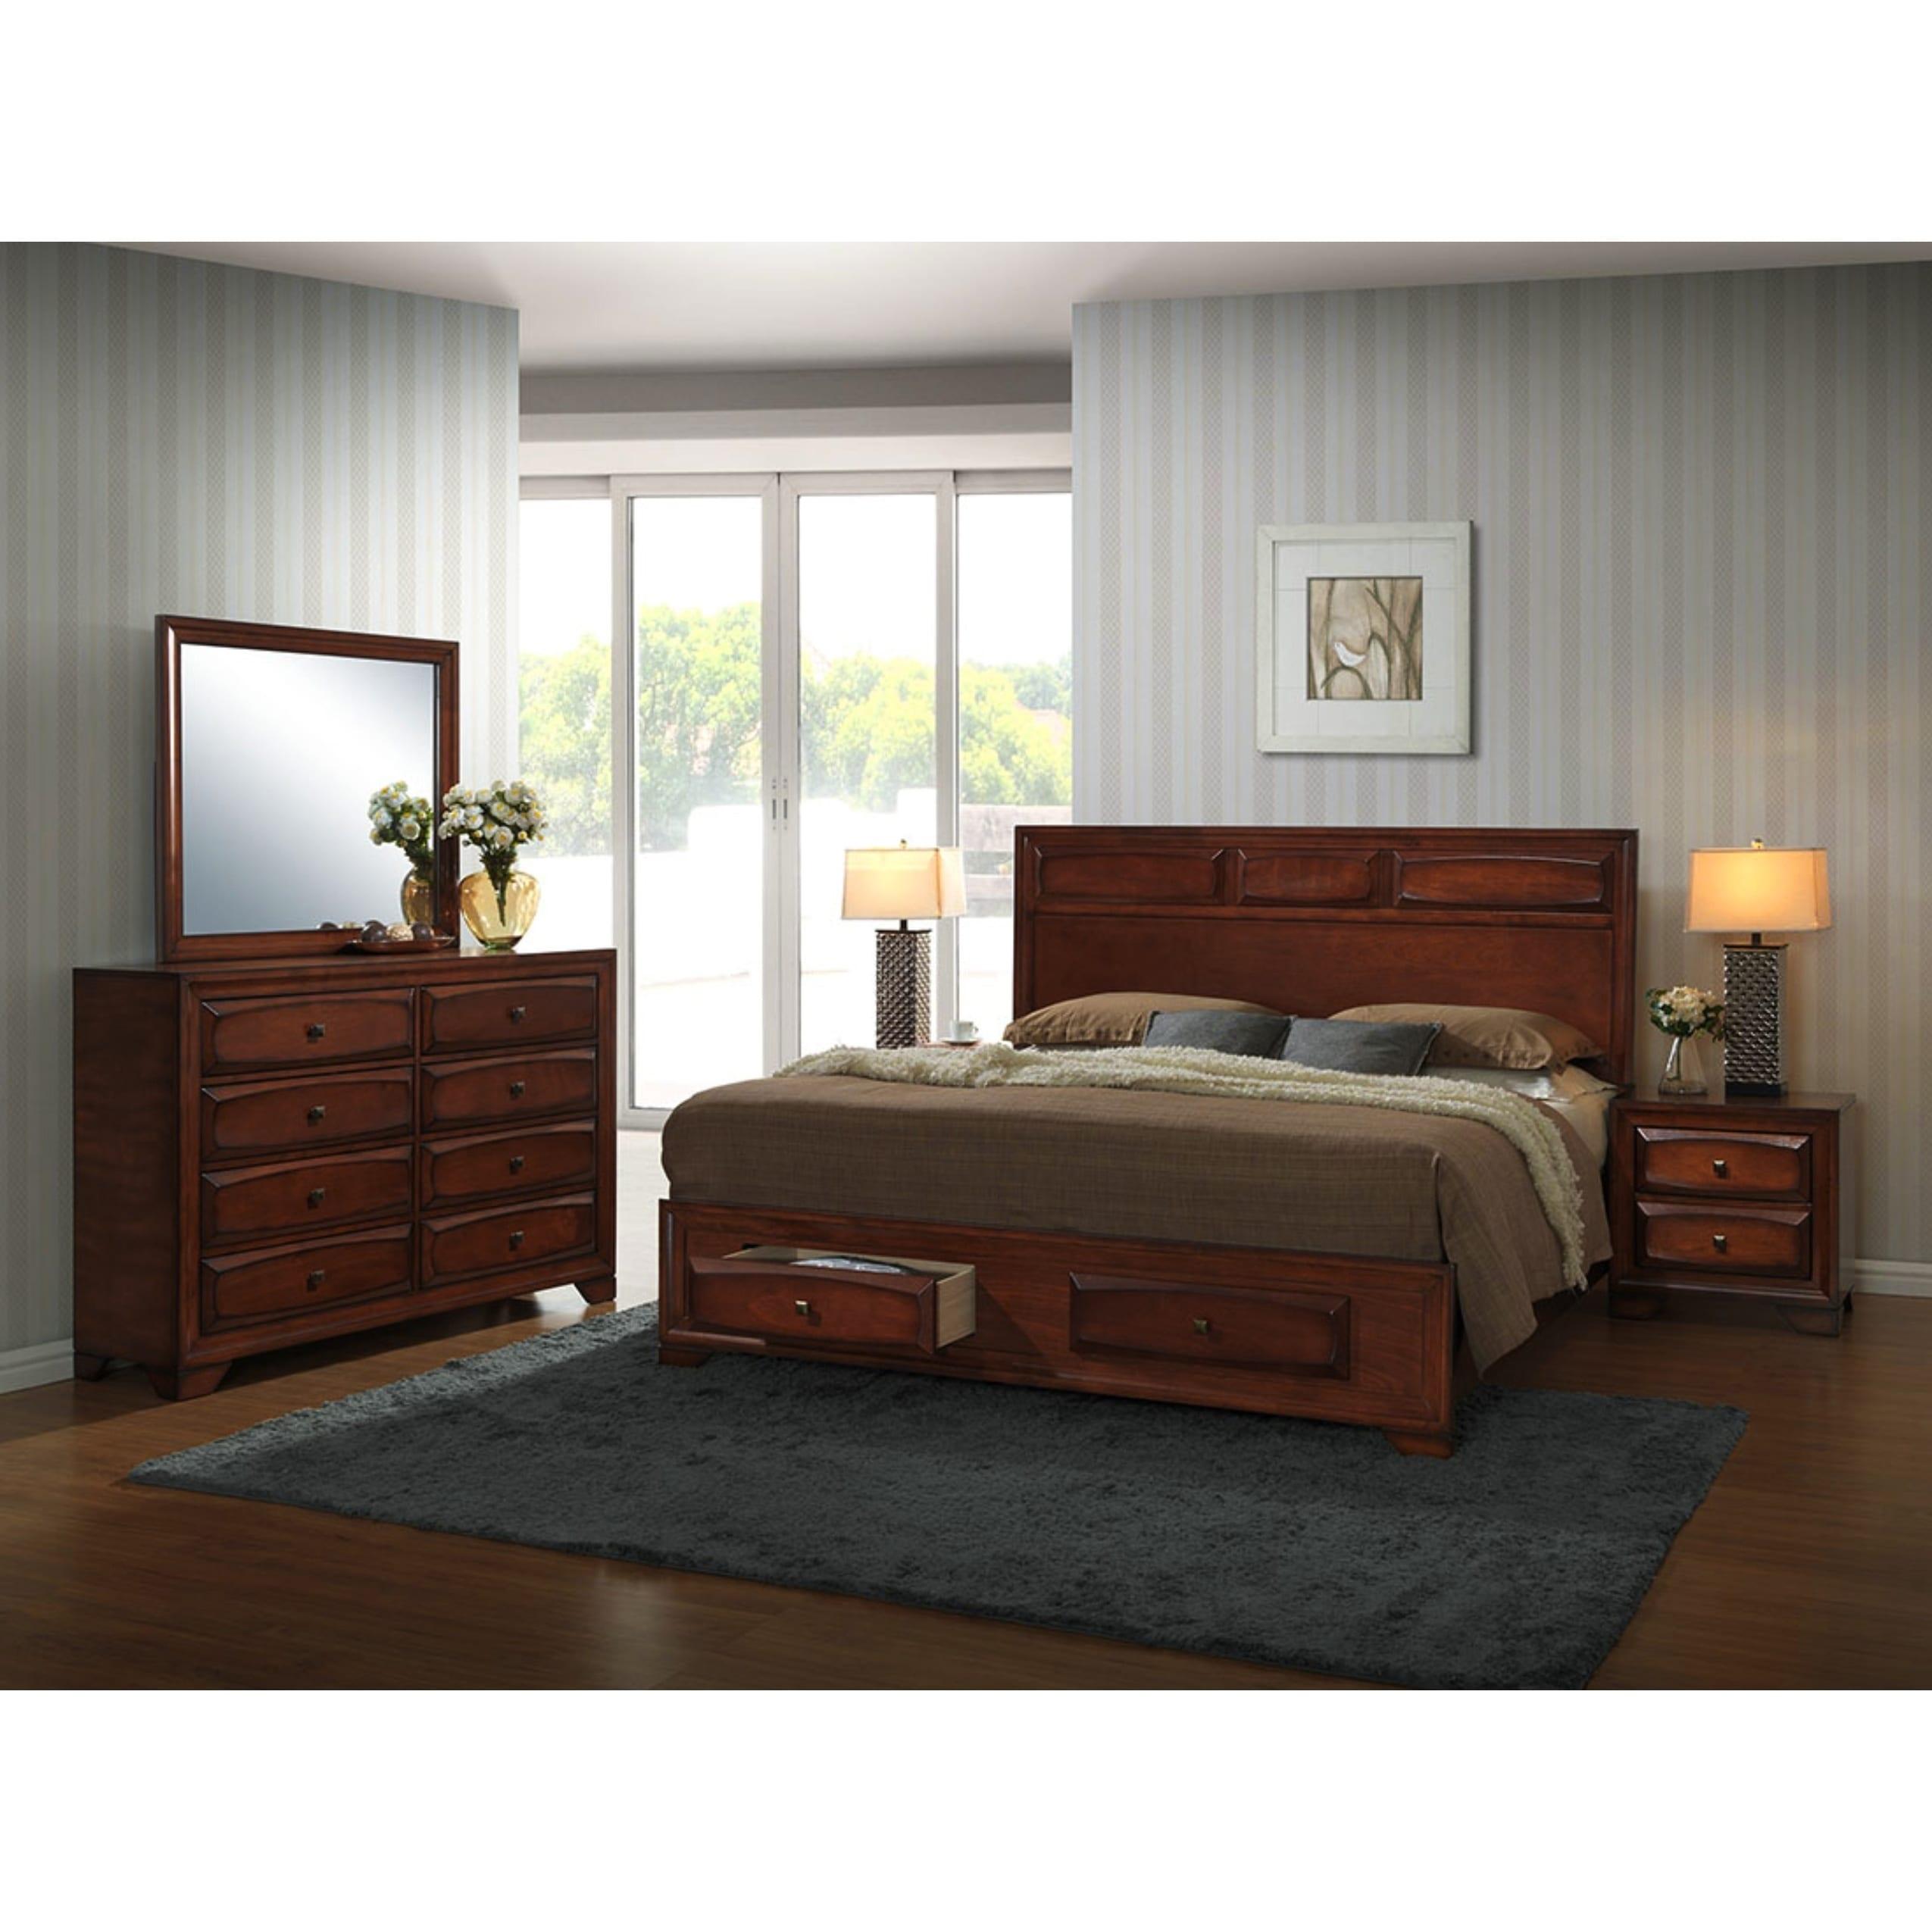 Oakland Antique Oak 5-piece King-size Bedroom Set